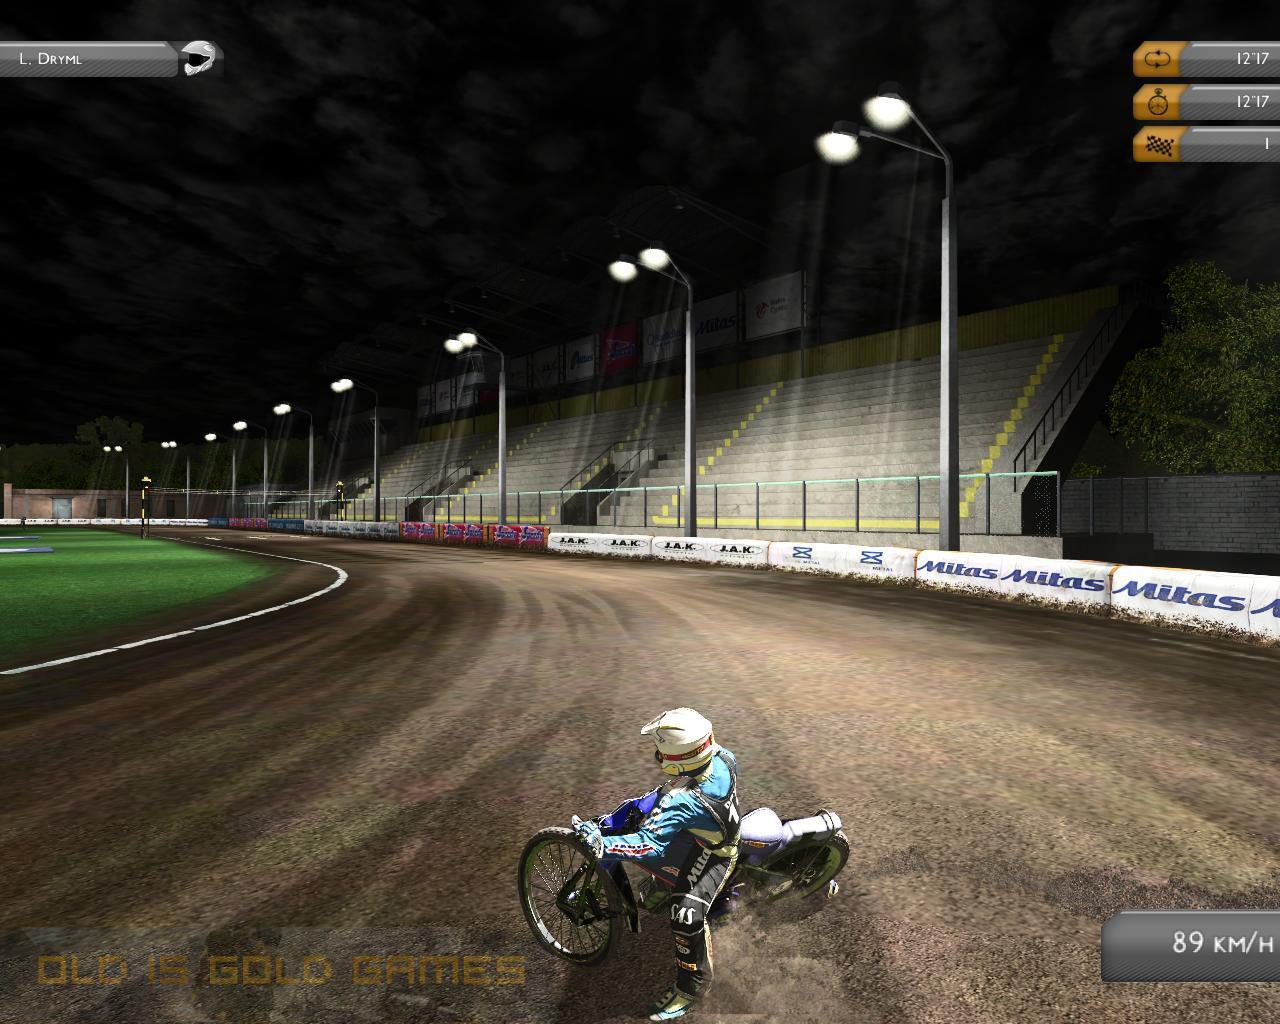 Fim Speedway Grand Prix 4 Features